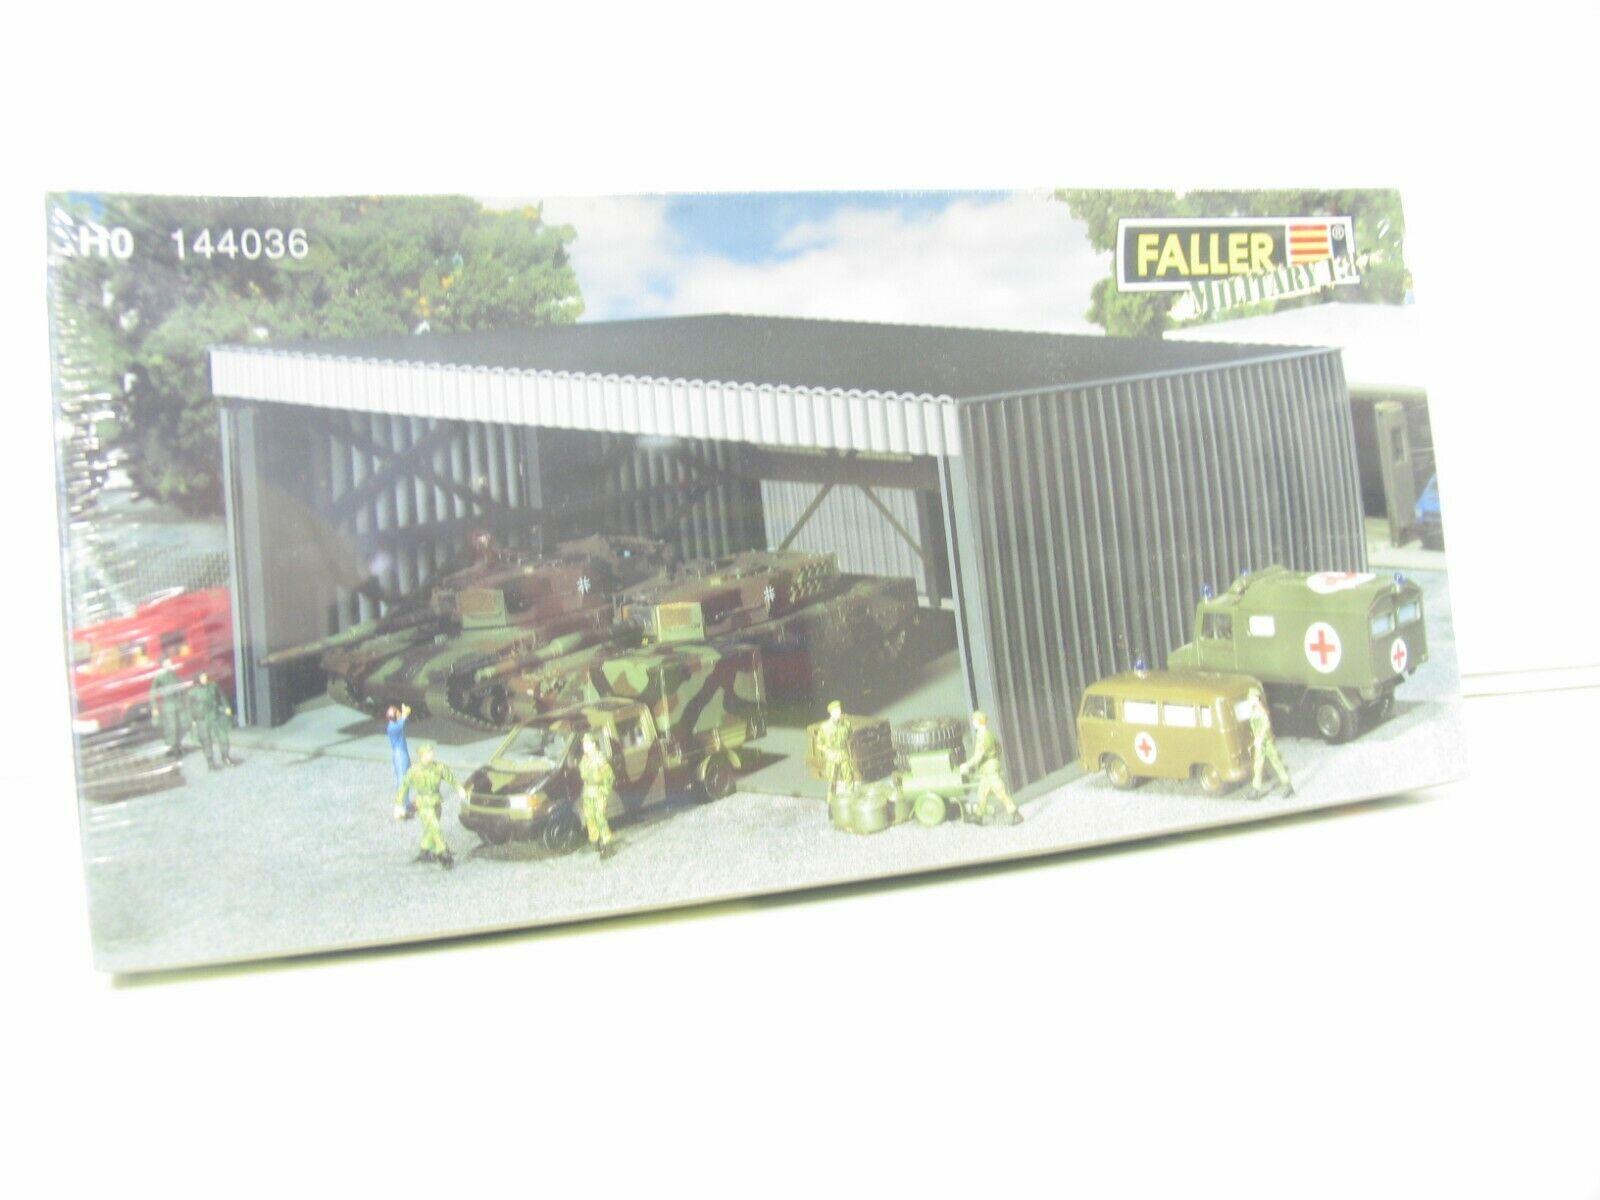 Faller 144036 HO KIT Vehicle Dugout OVP Shrink Wrapped JS755